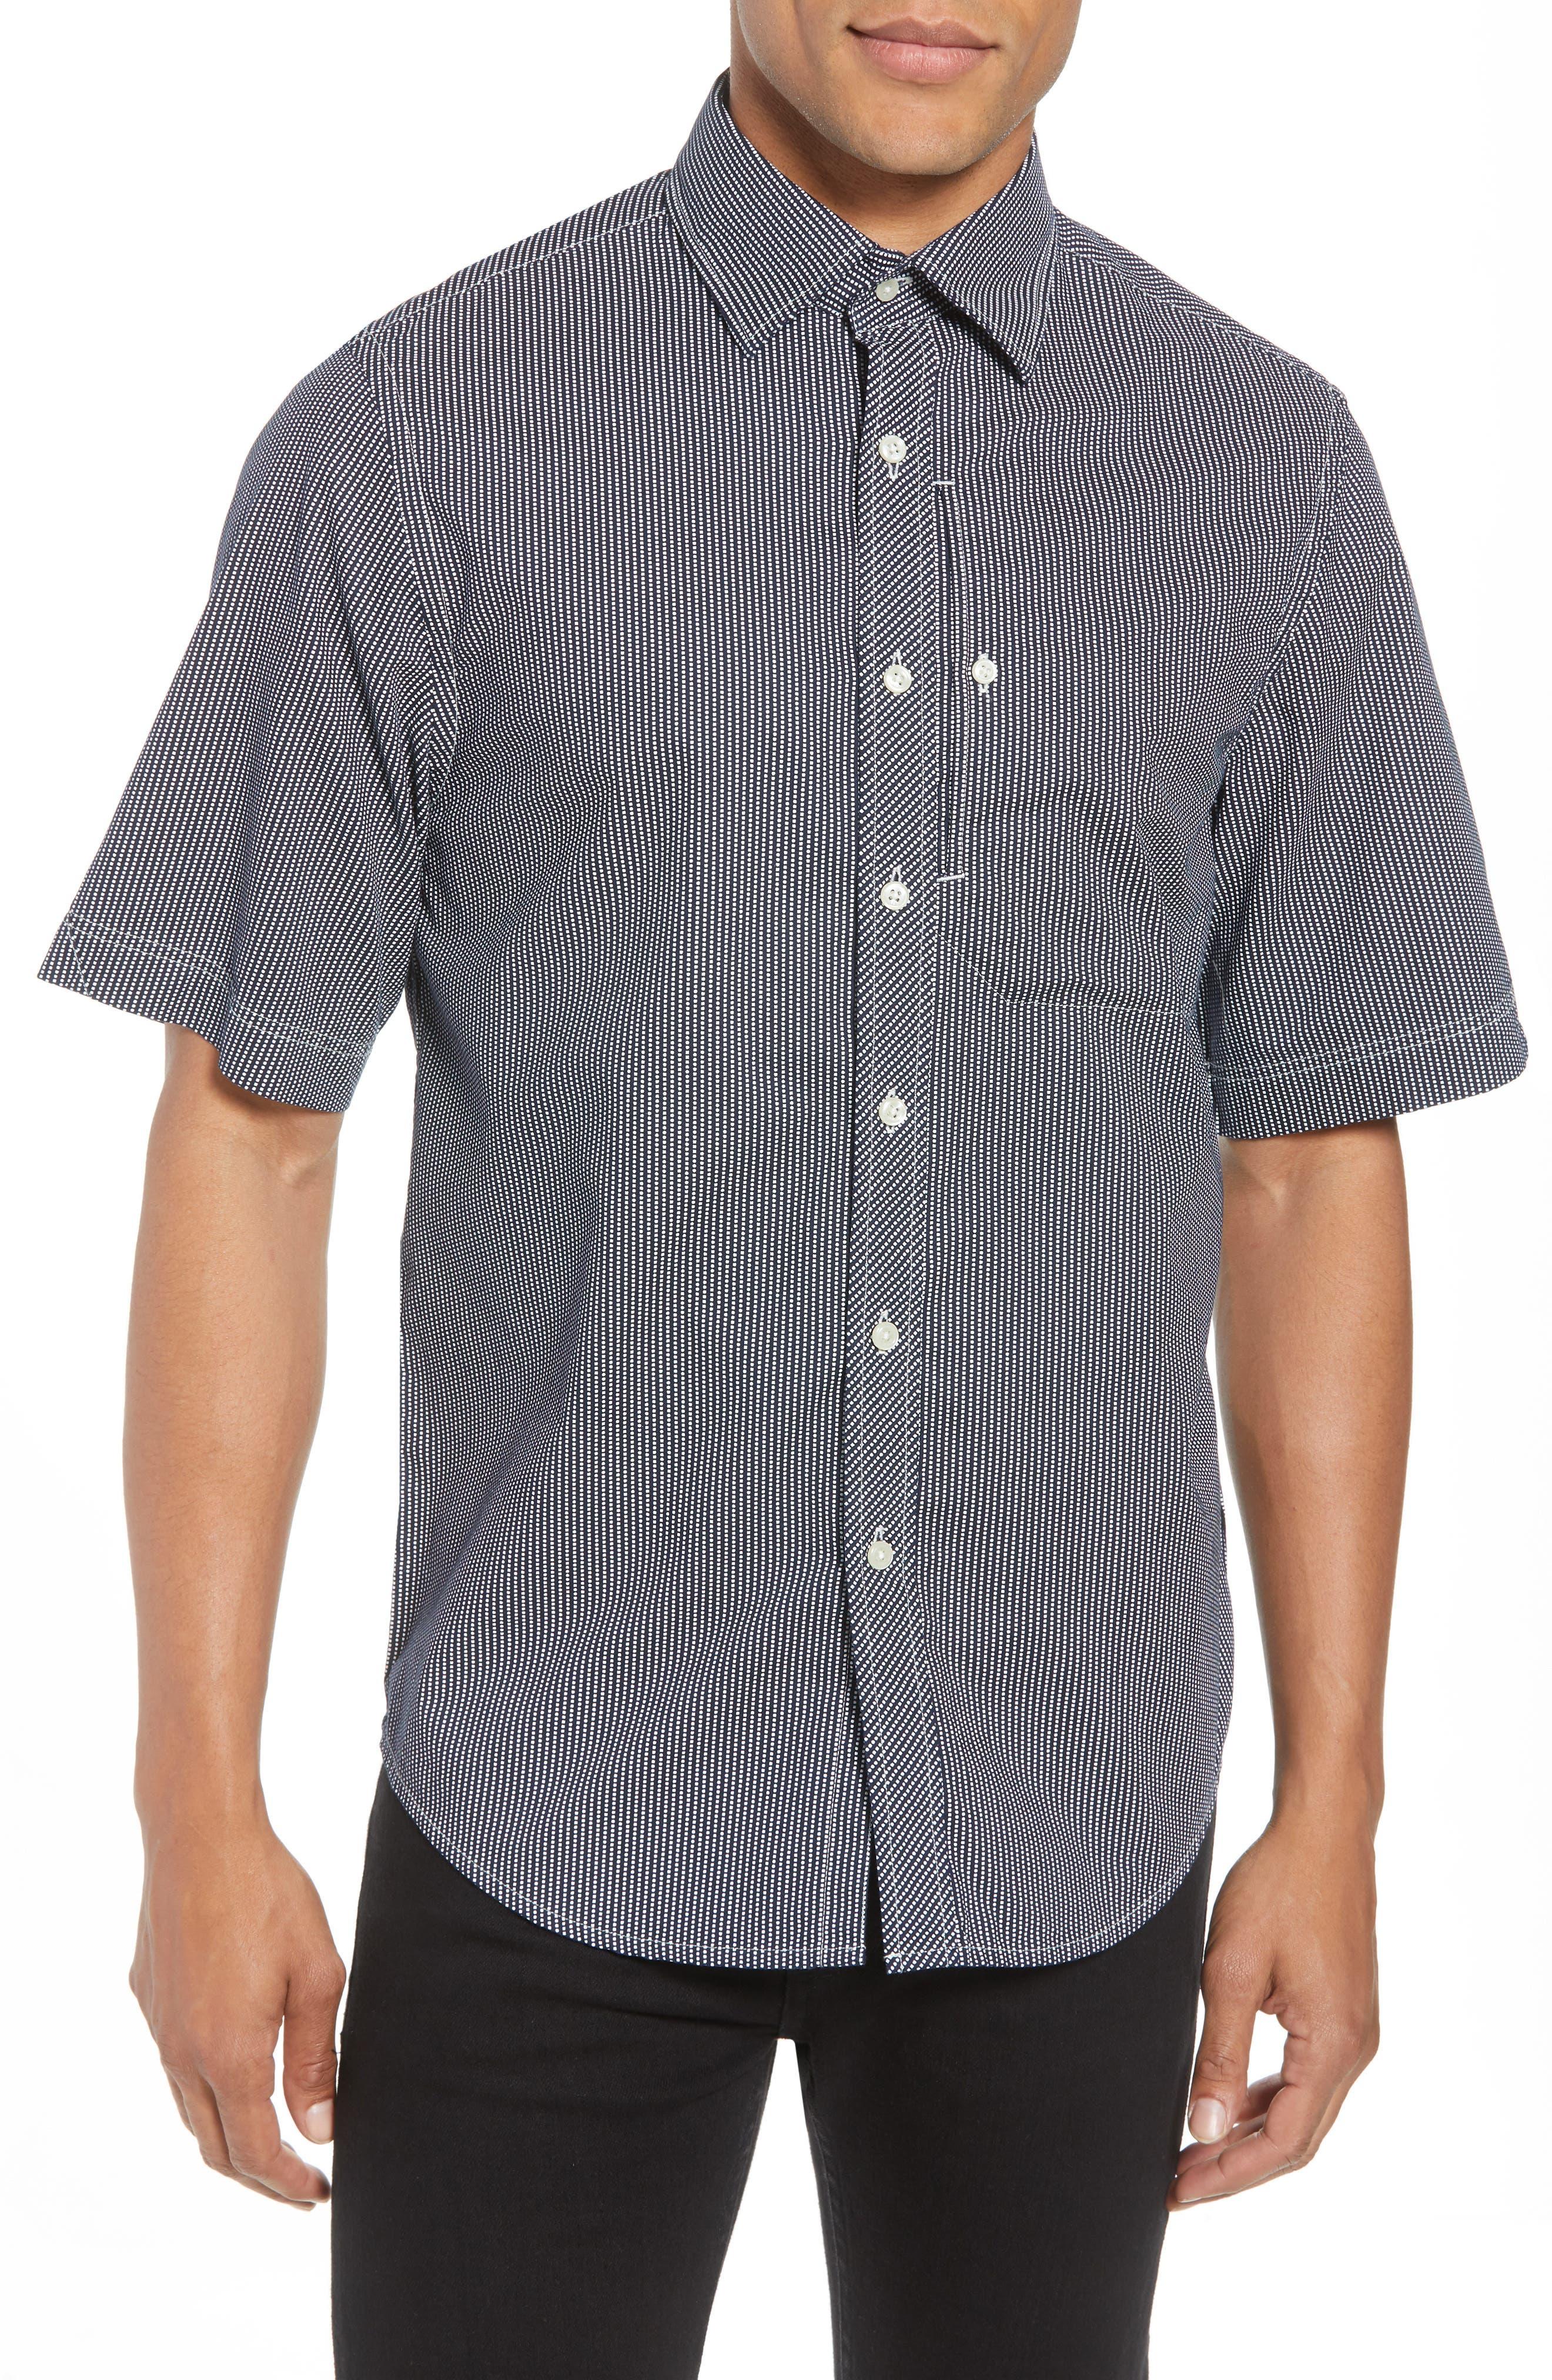 Bristum Straight Ref Shirt,                             Main thumbnail 1, color,                             Sartho Blue/ Milk